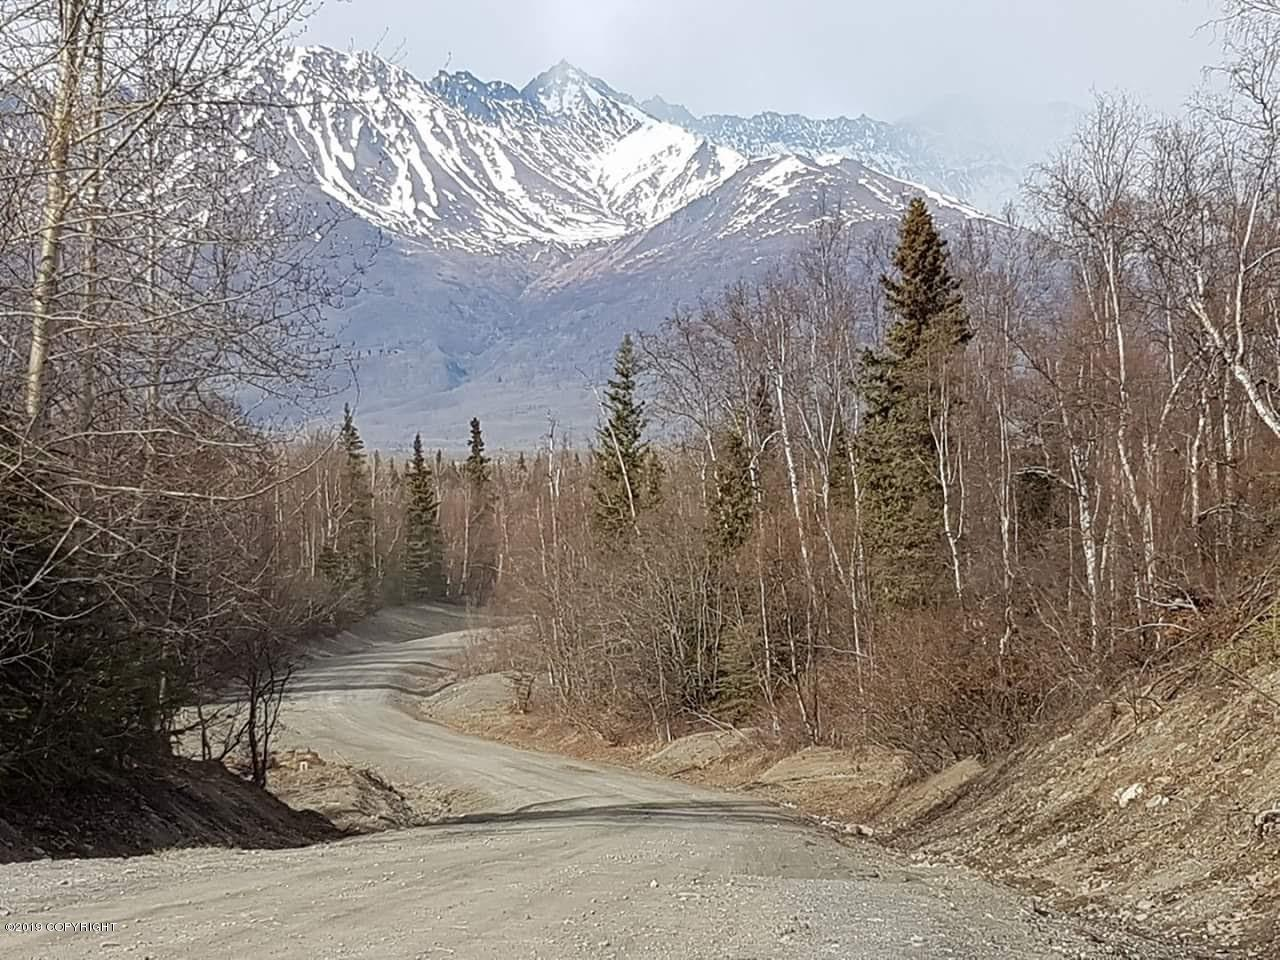 https://bt-photos.global.ssl.fastly.net/alaska/1280_boomver_1_19-13934-2.jpg